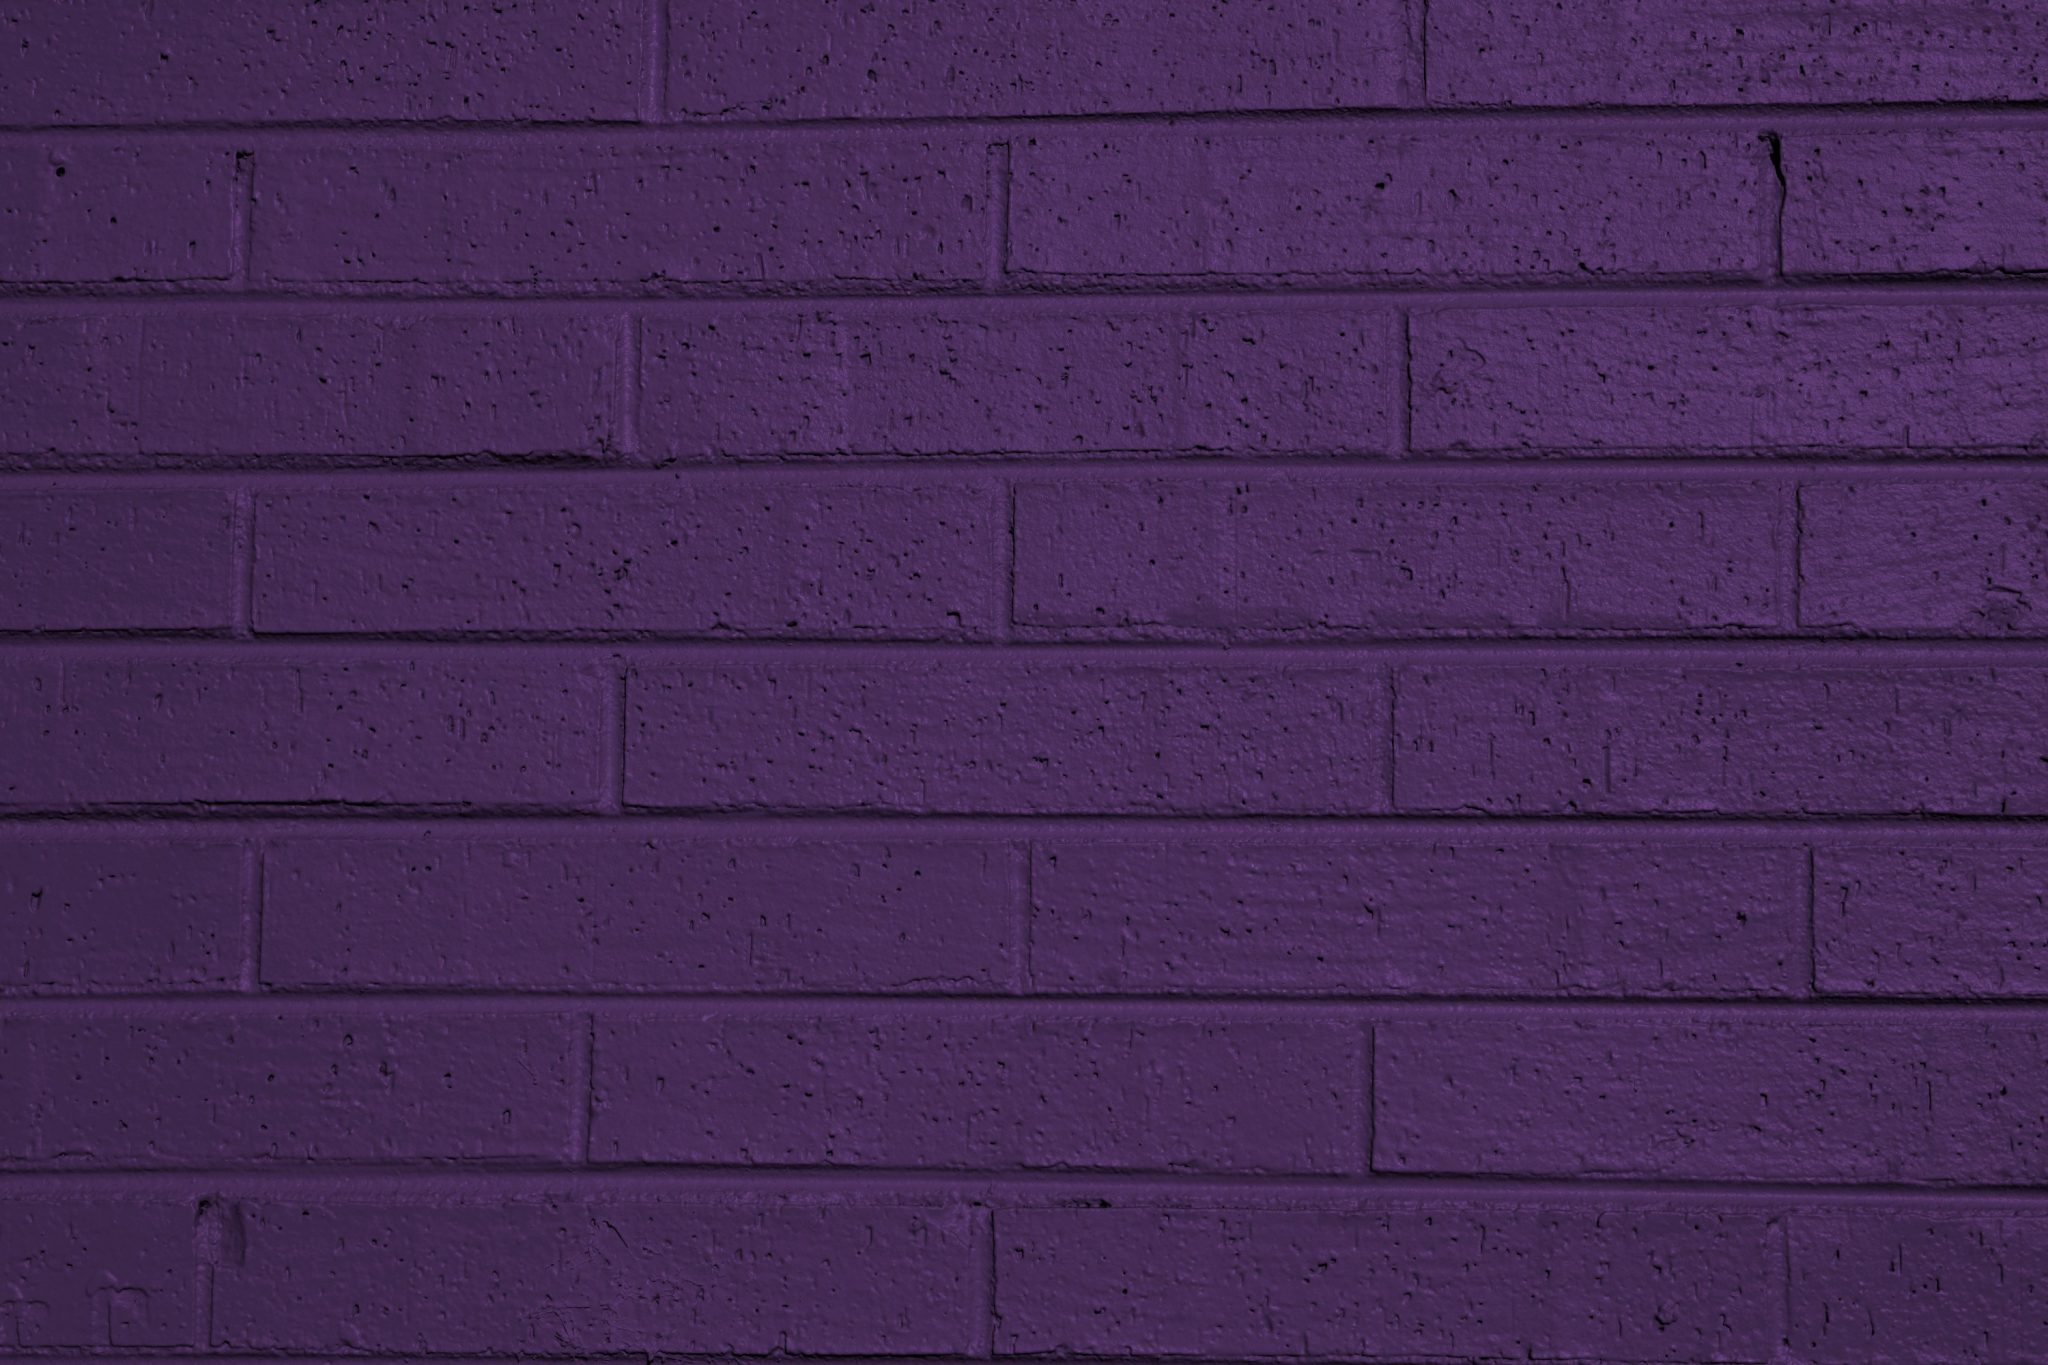 Cozy Bedroom Purple Painted Brick Wall Texture Purple Paint Colors Behr Purple Paint Colors houzz-02 Purple Paint Colors